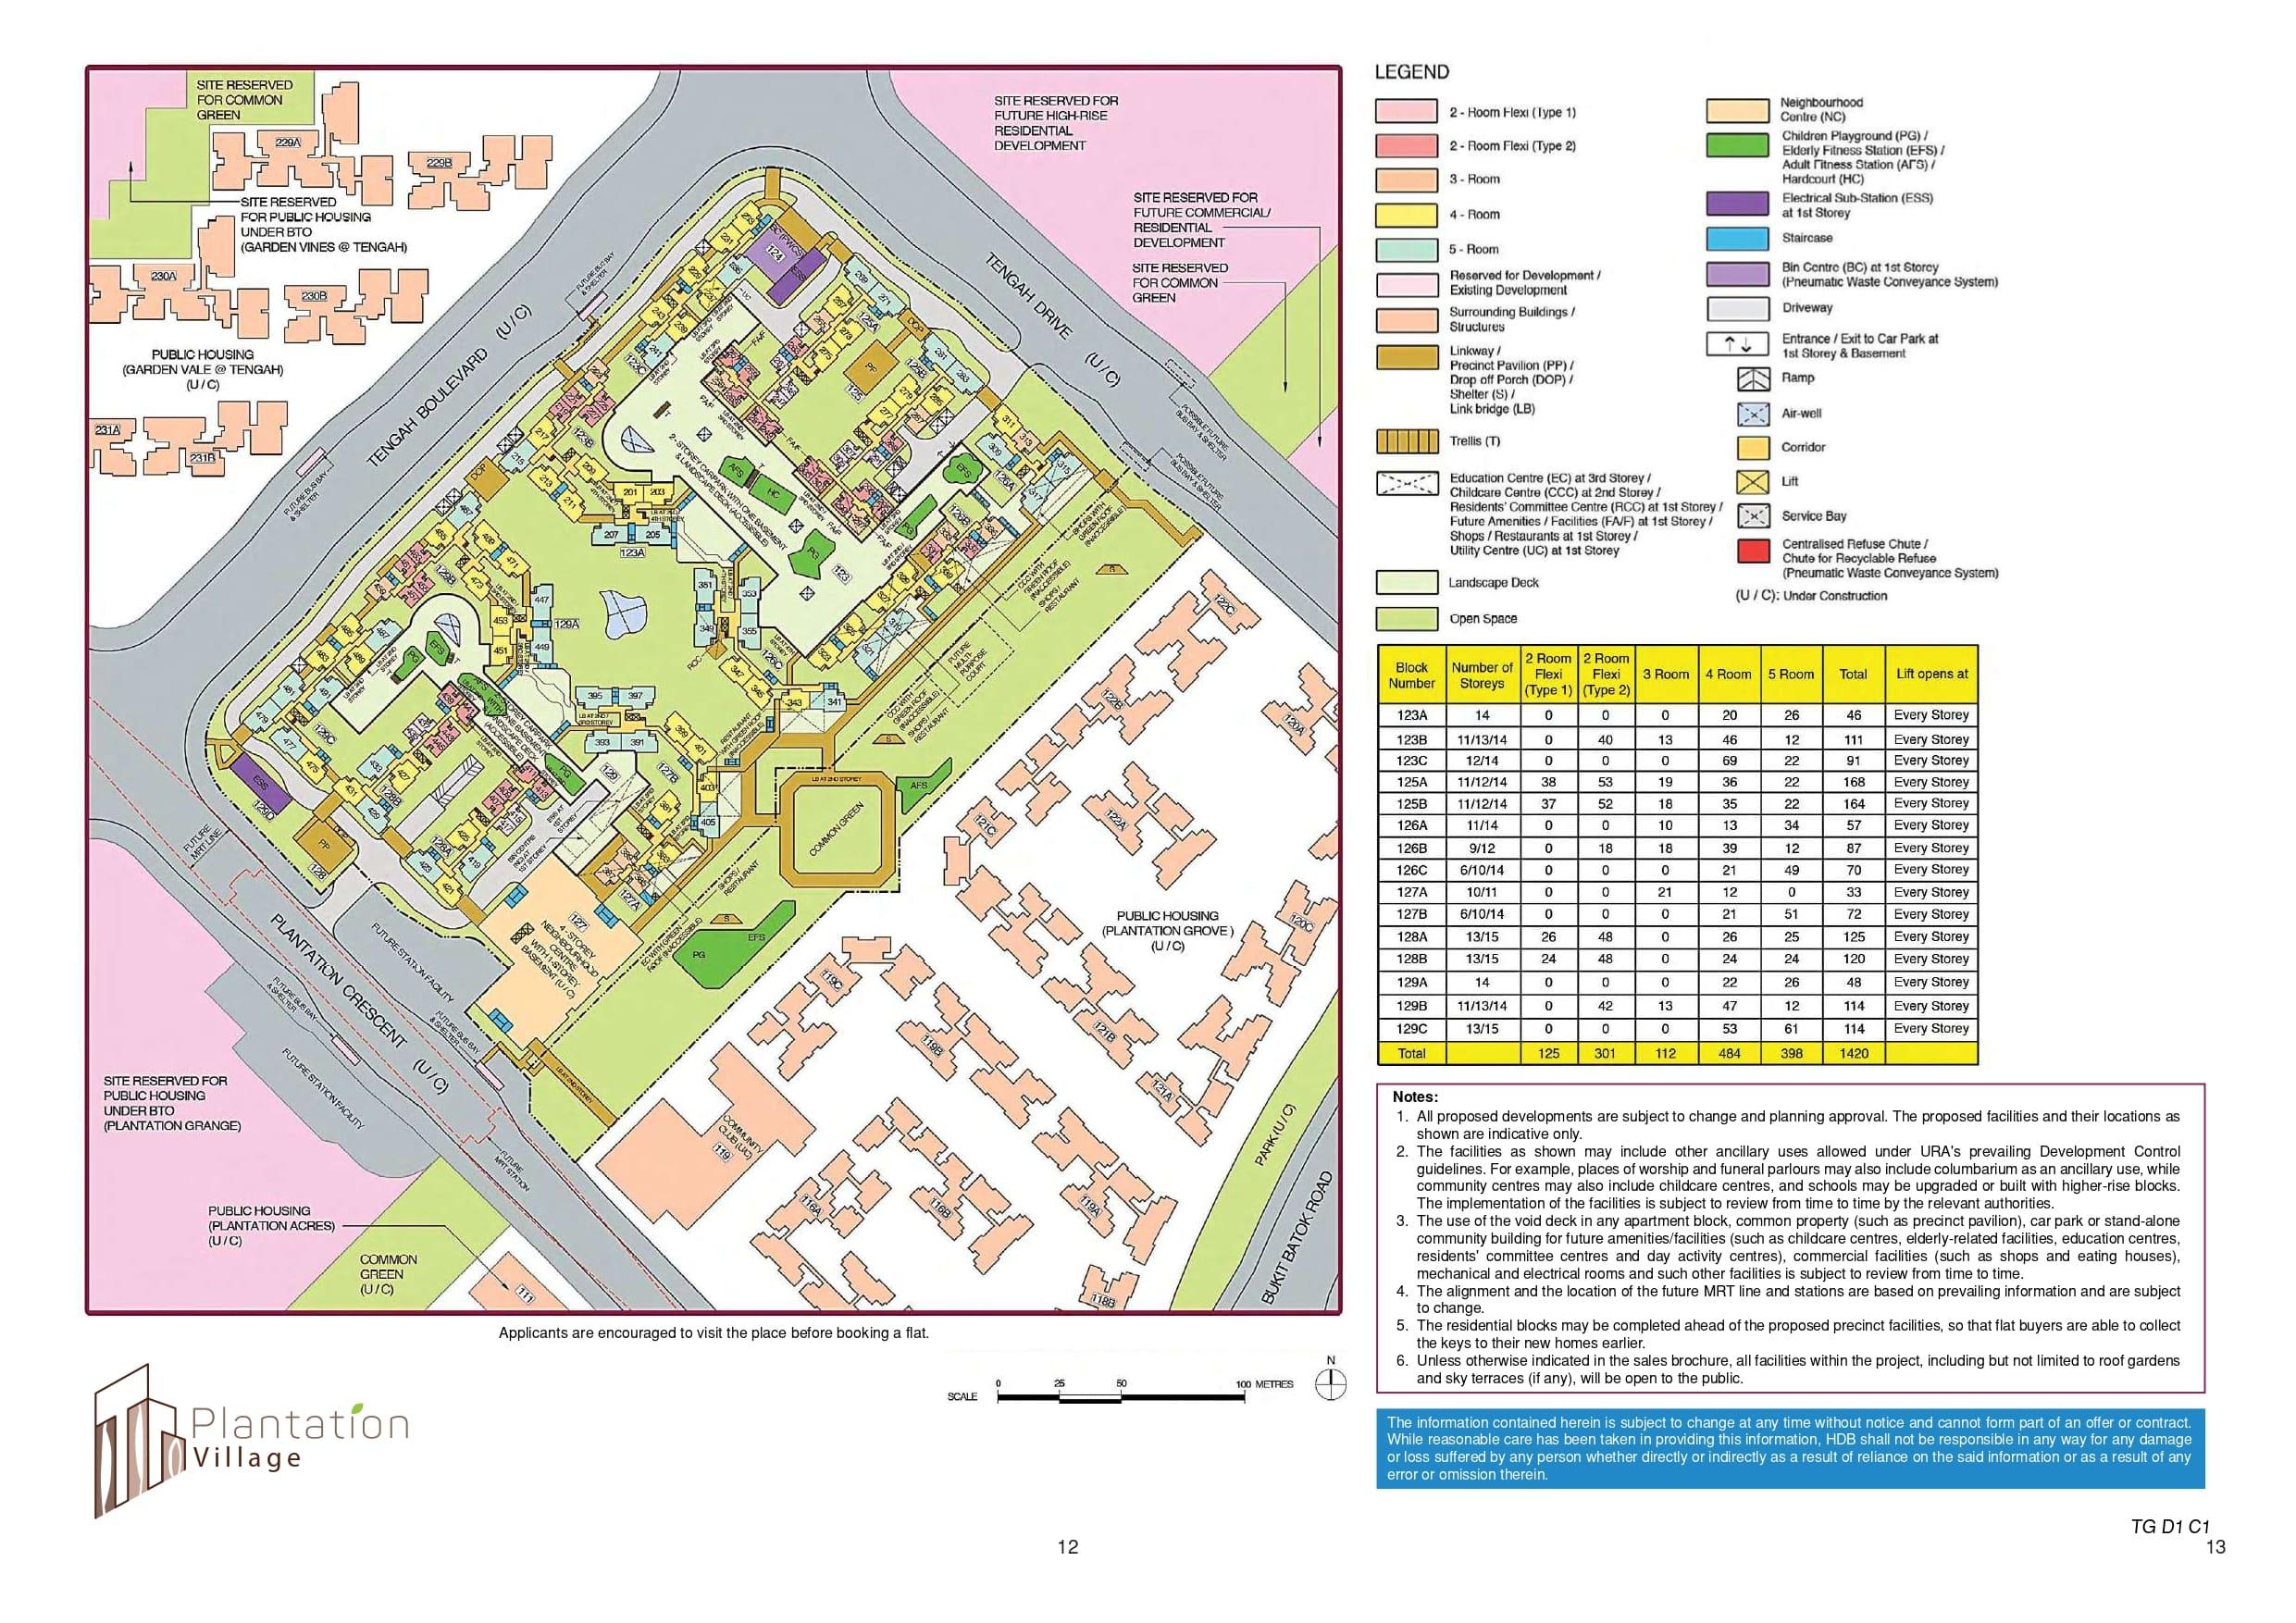 Plantation Village Site Plan